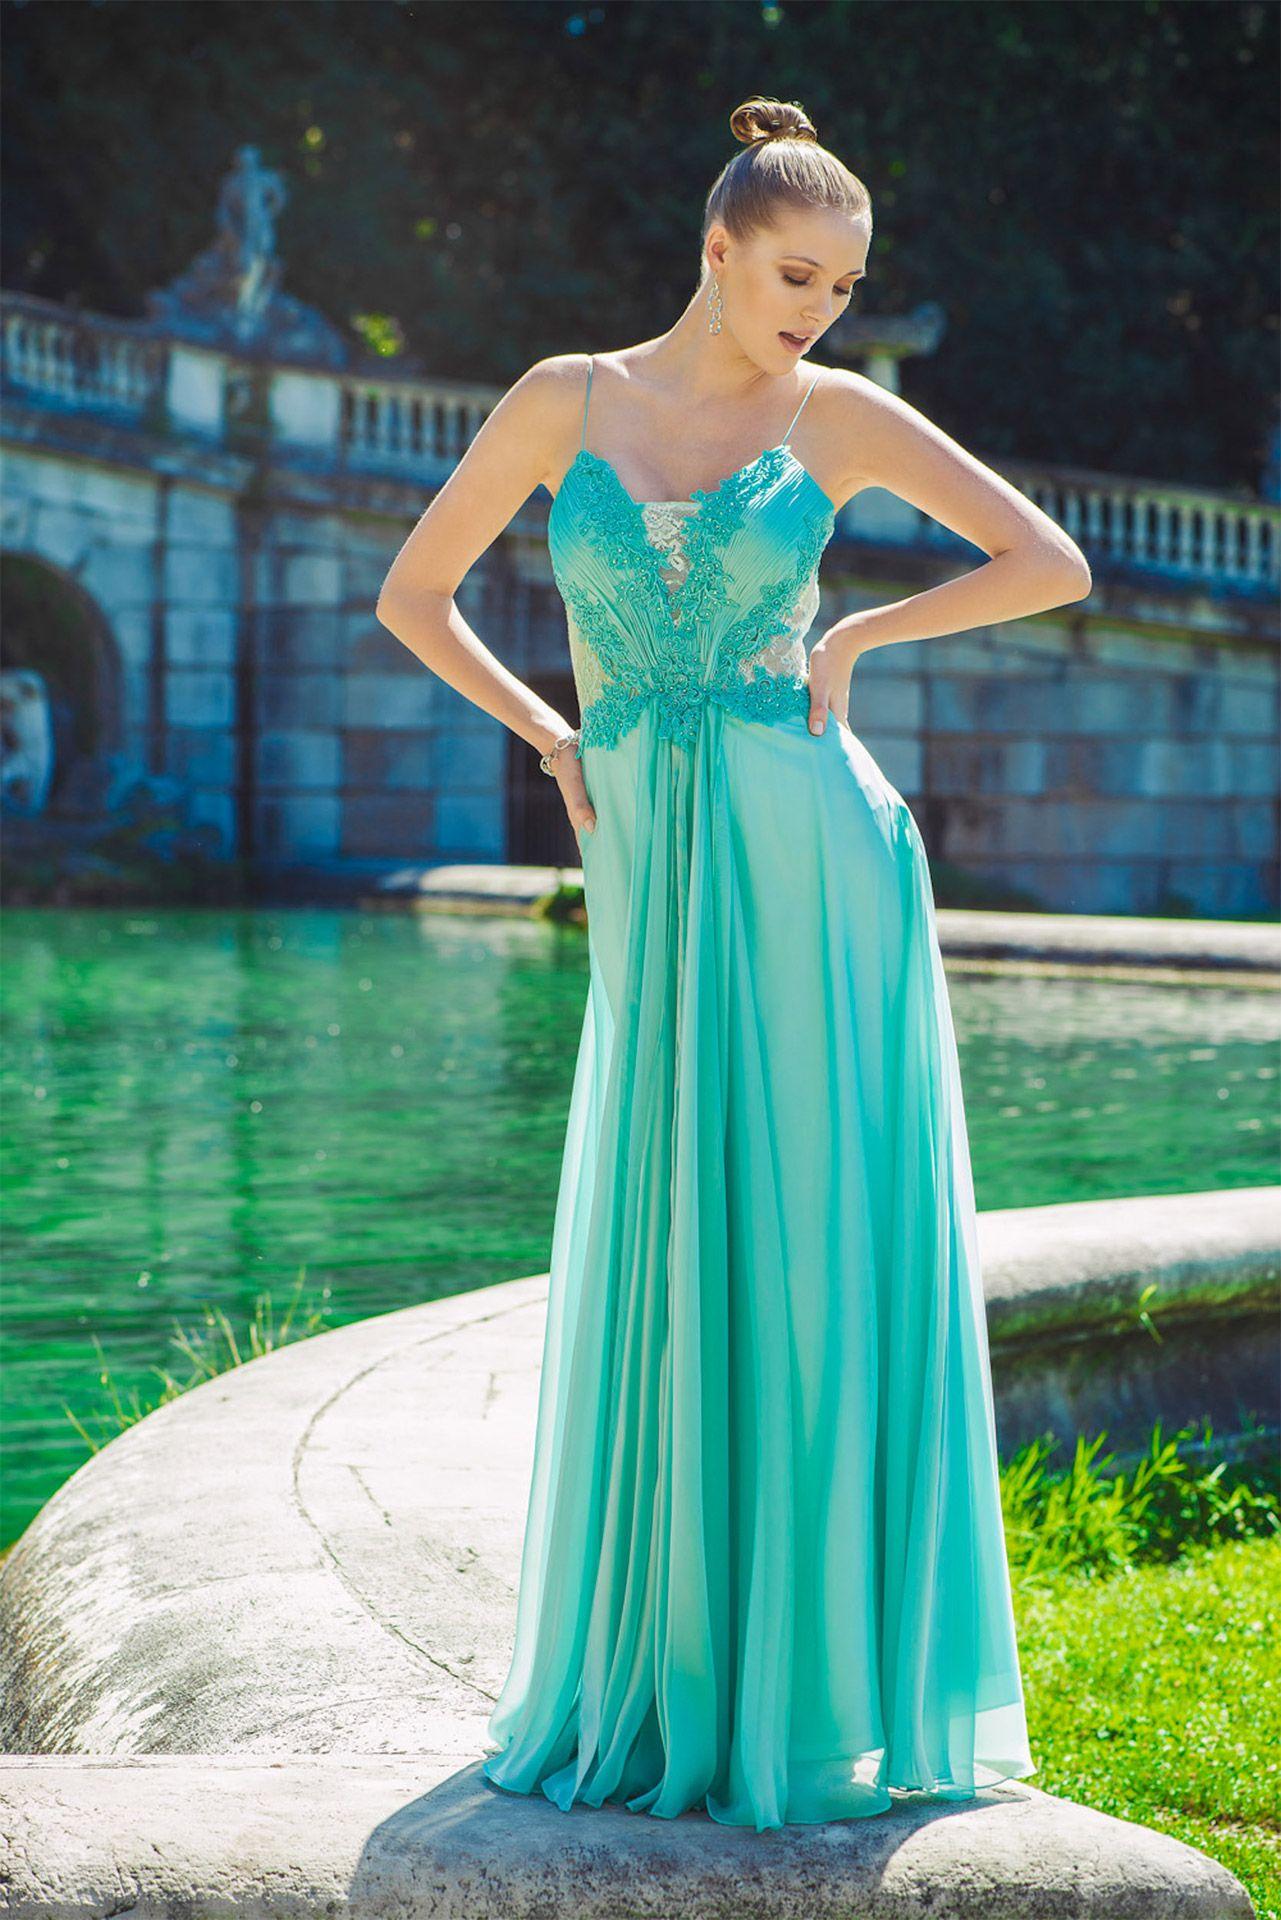 buy online 9d17a 386b7 abiti #cerimonia #abito #sera #cocktaildress #dress ...